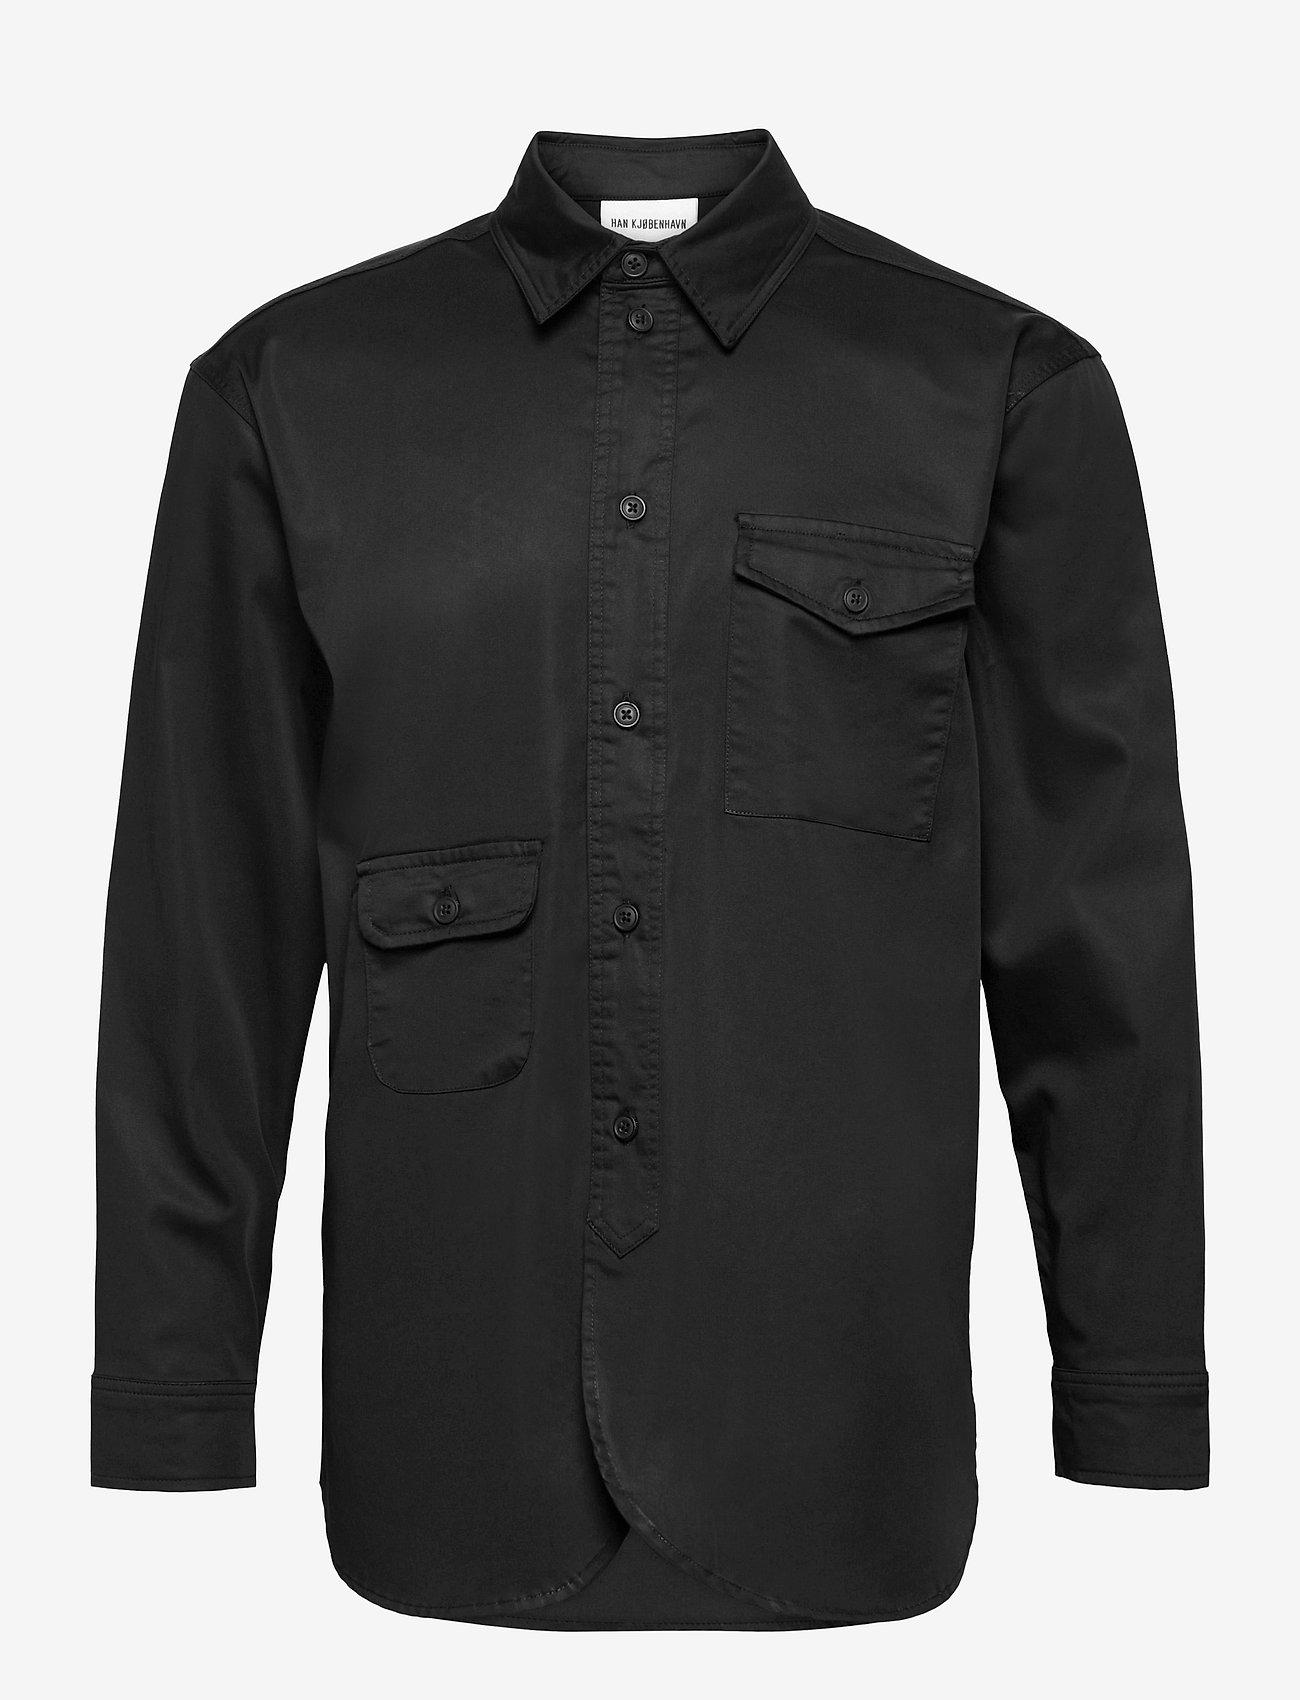 HAN Kjøbenhavn - Army Shirt - oxford overhemden - black - 1